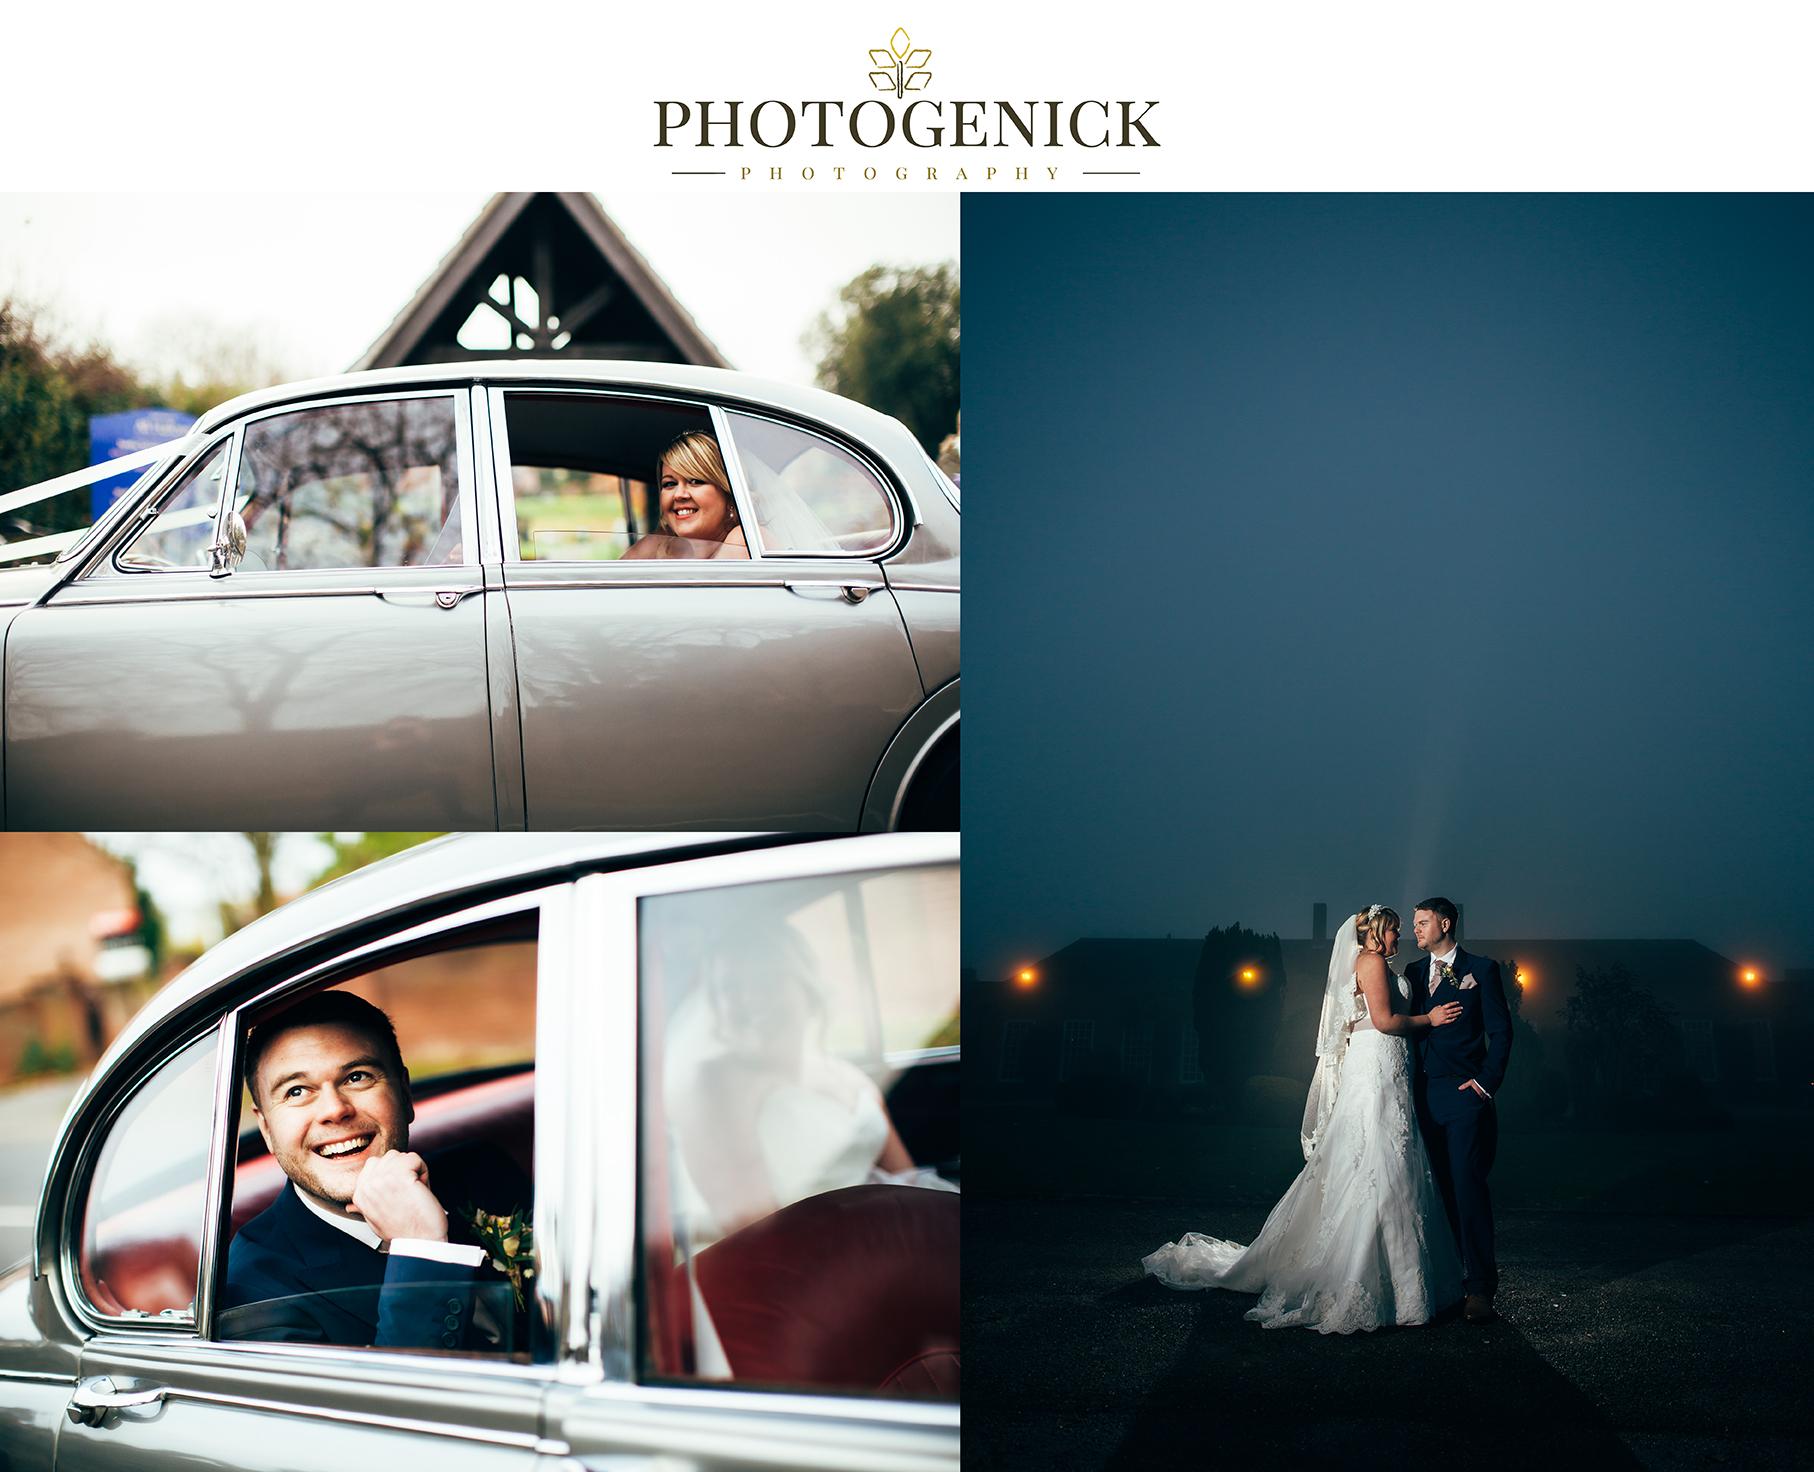 lincolnshire wedding photographer-4.jpg